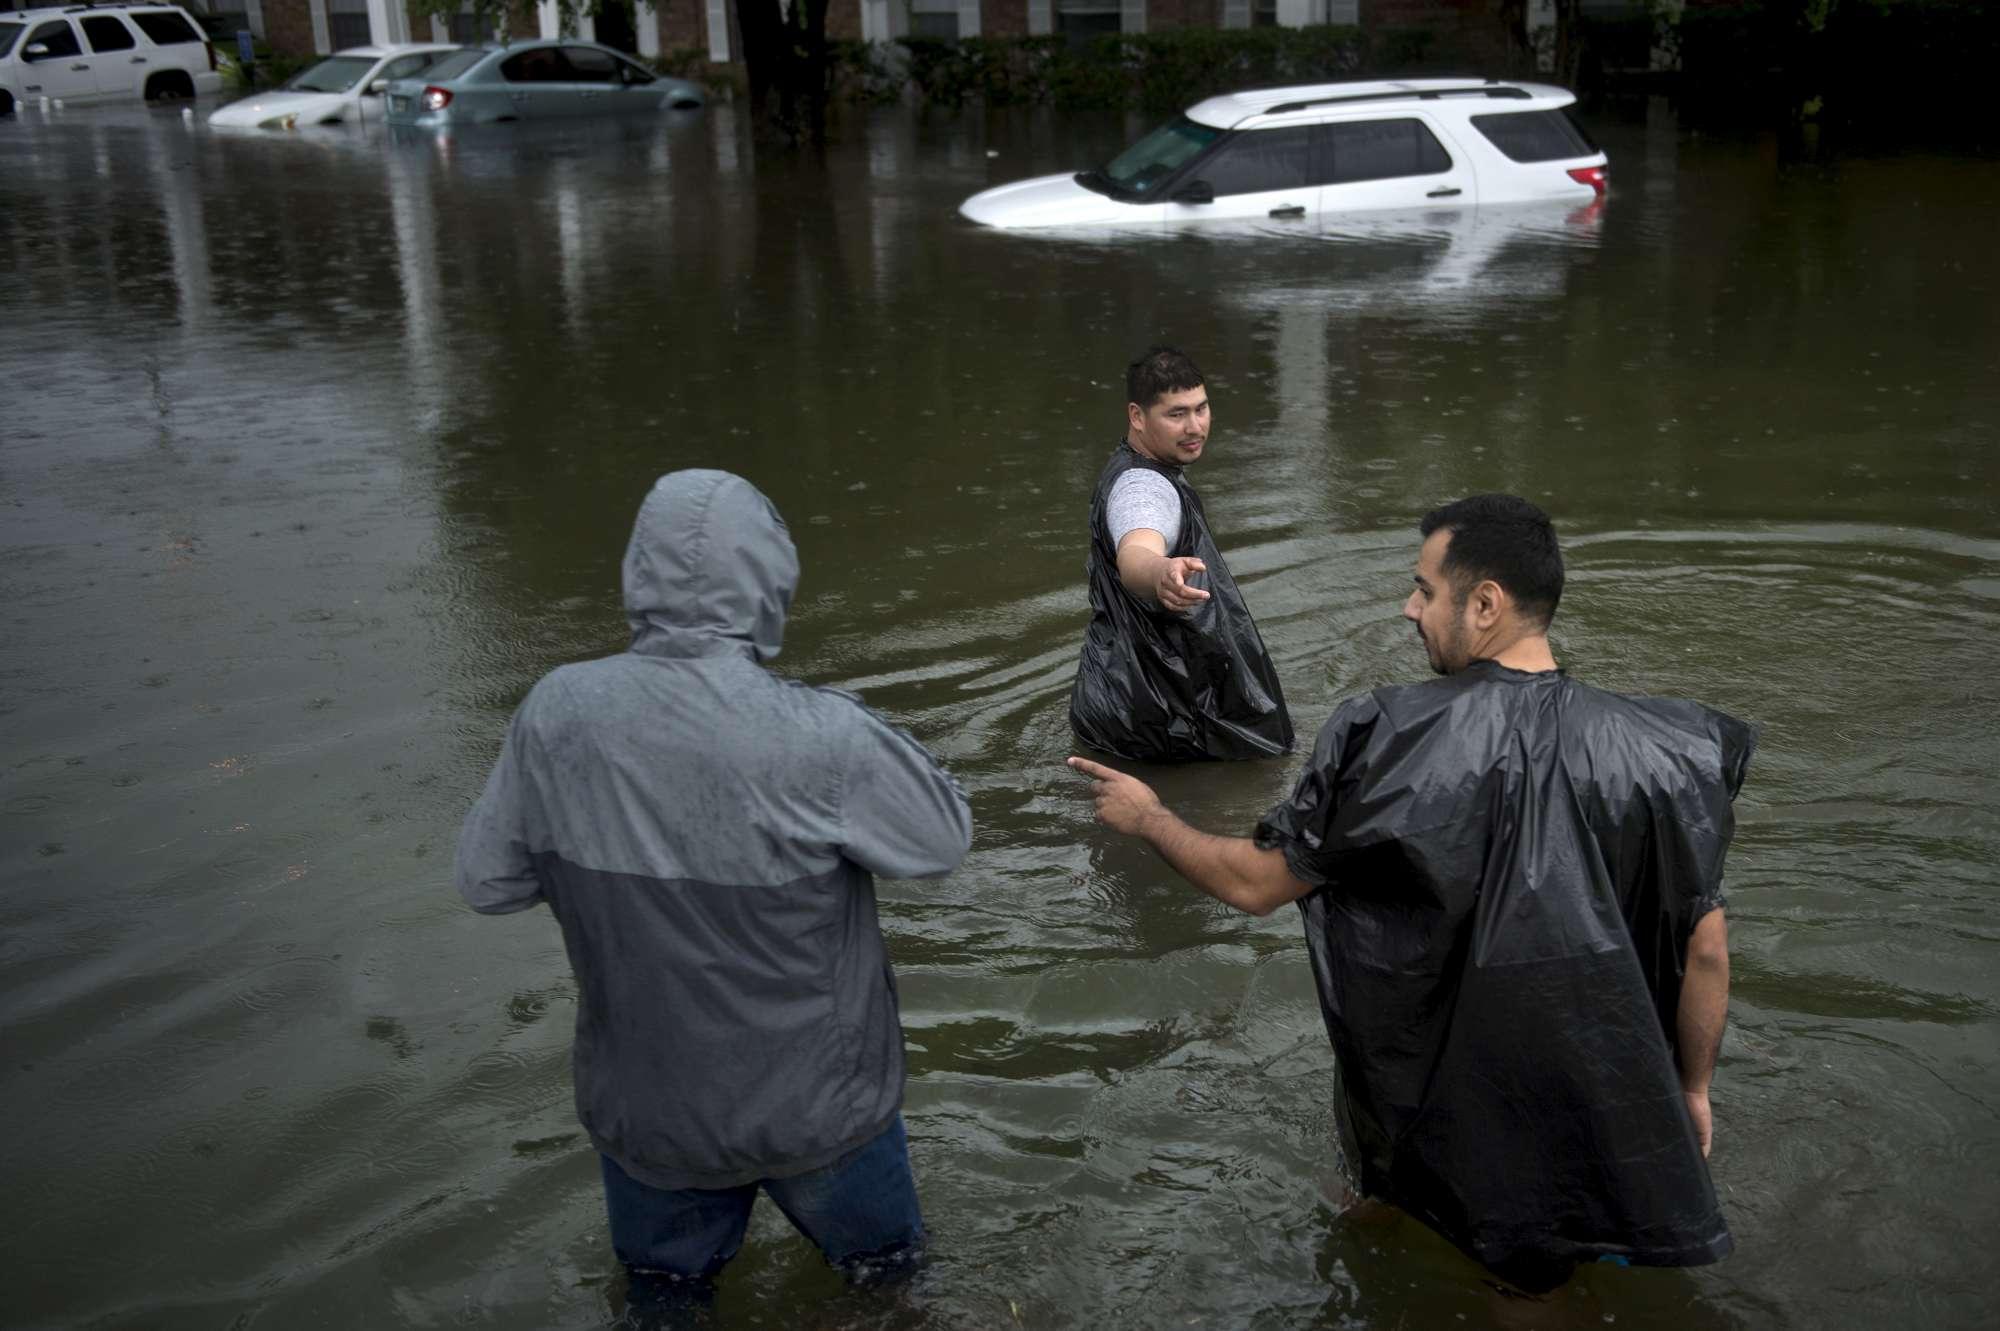 L uragano Harvey mette in ginocchio il Texas